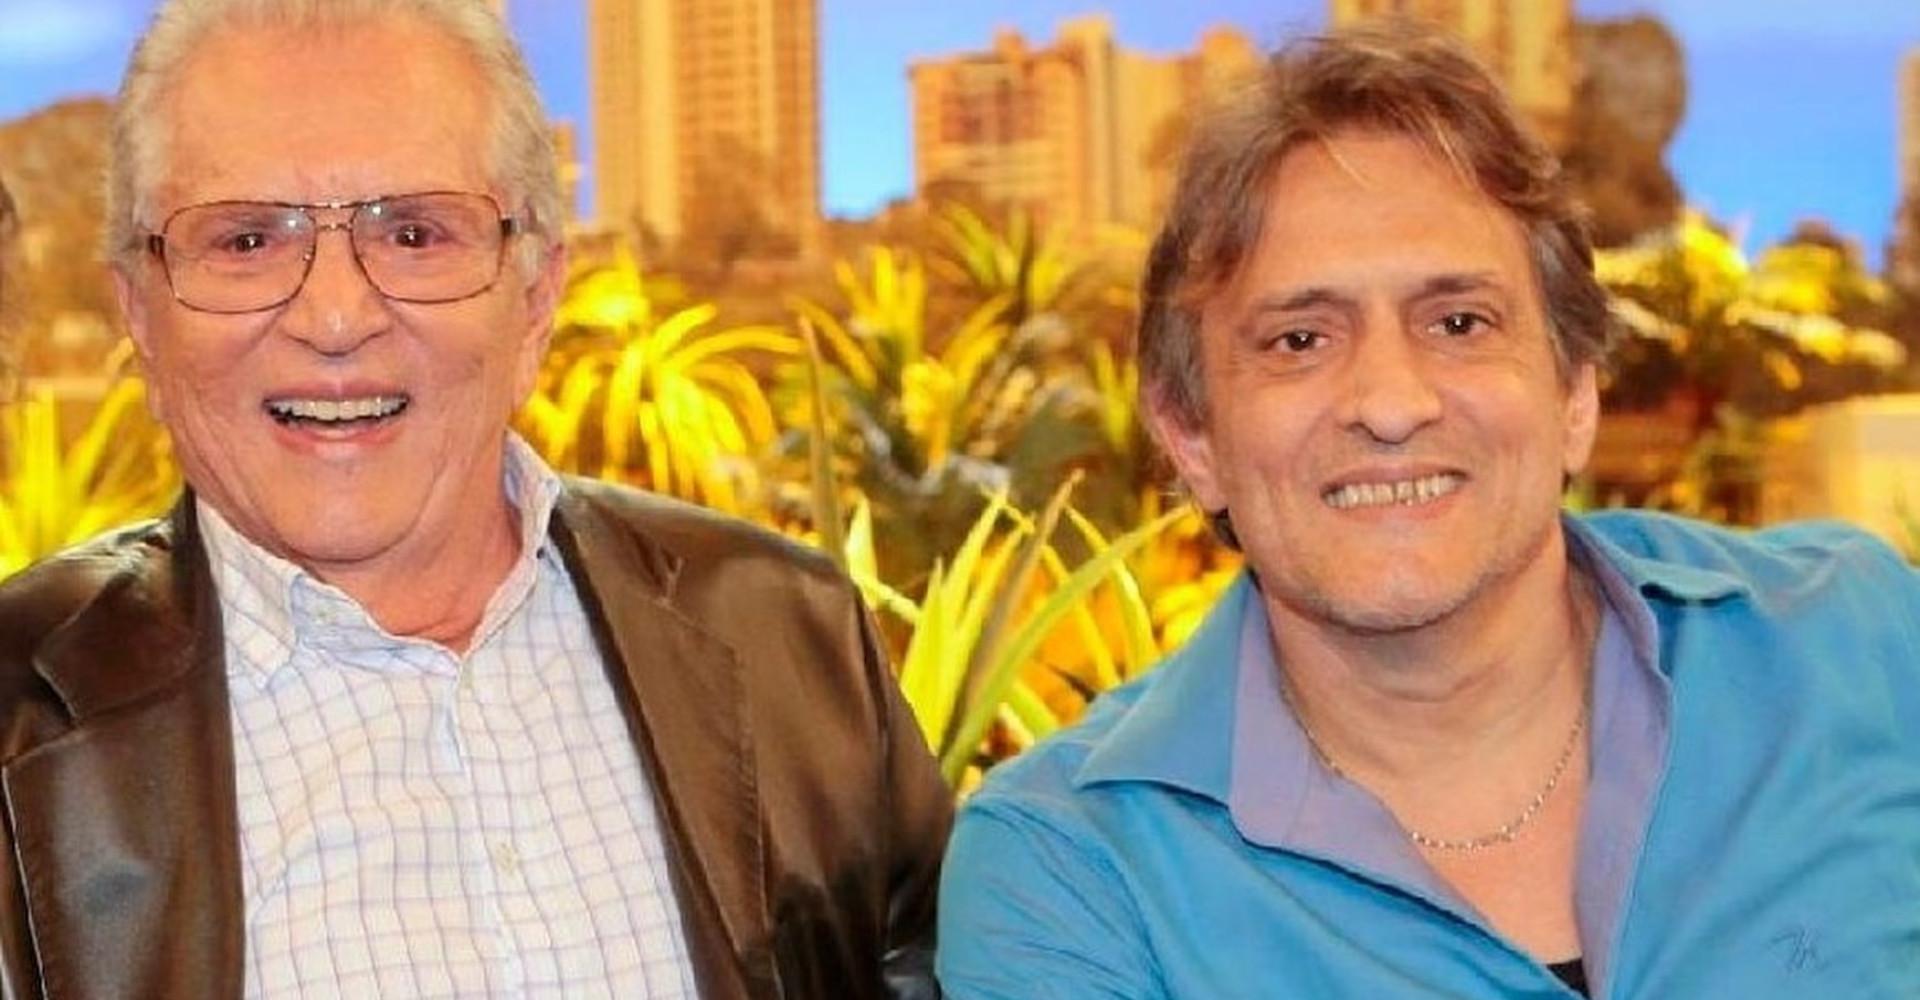 Carlos Alberto revela que Marcelo de Nóbrega sofreu grave infarto